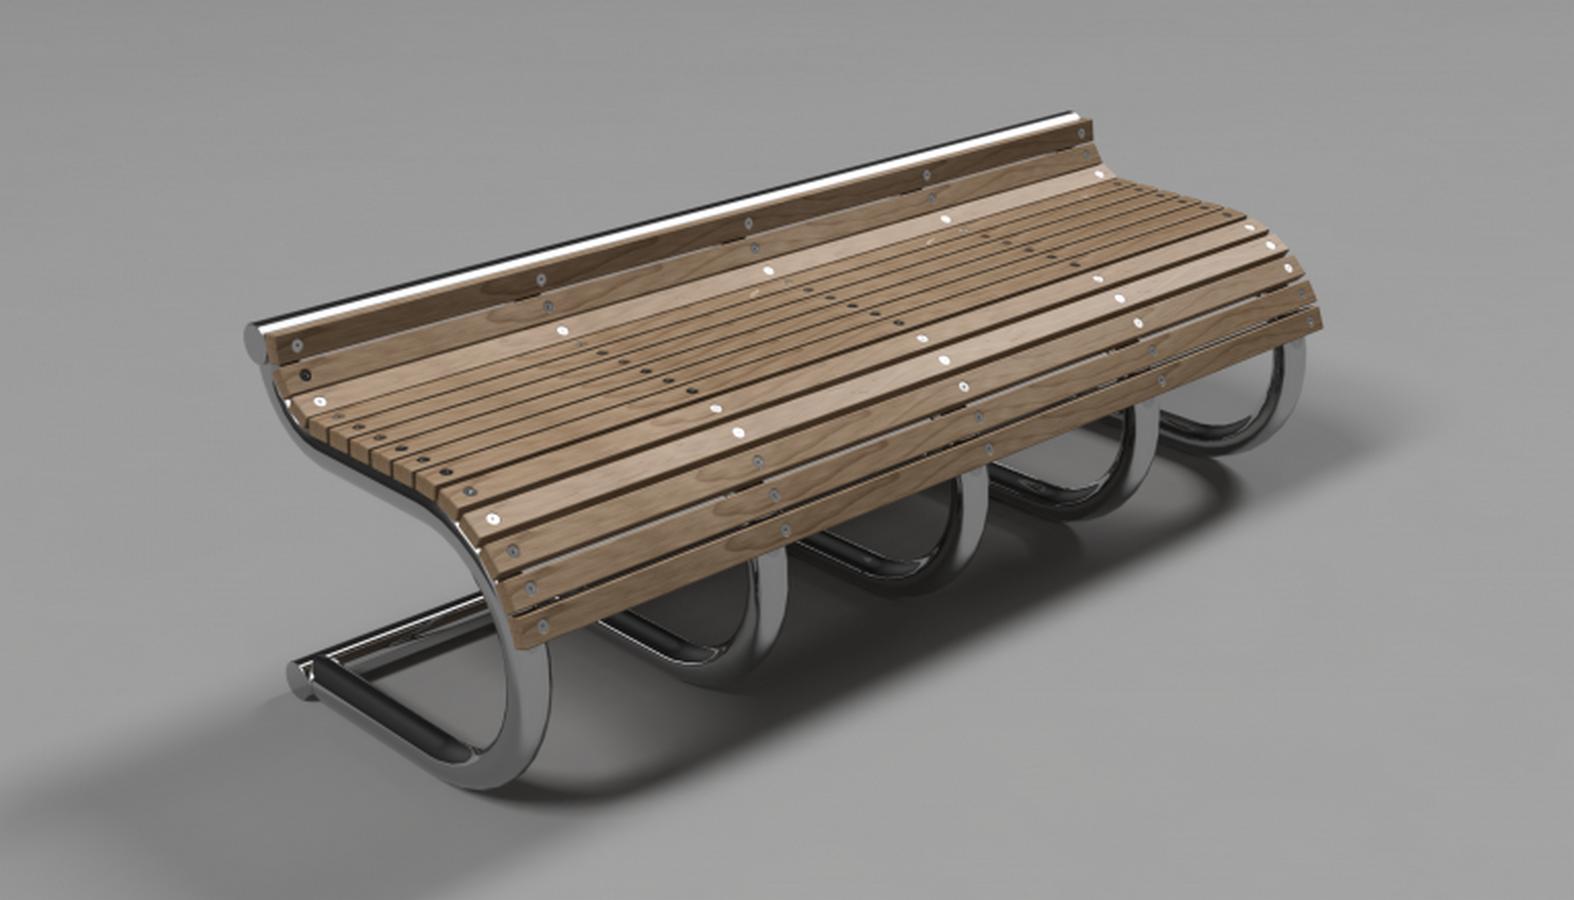 Concept Street Bench